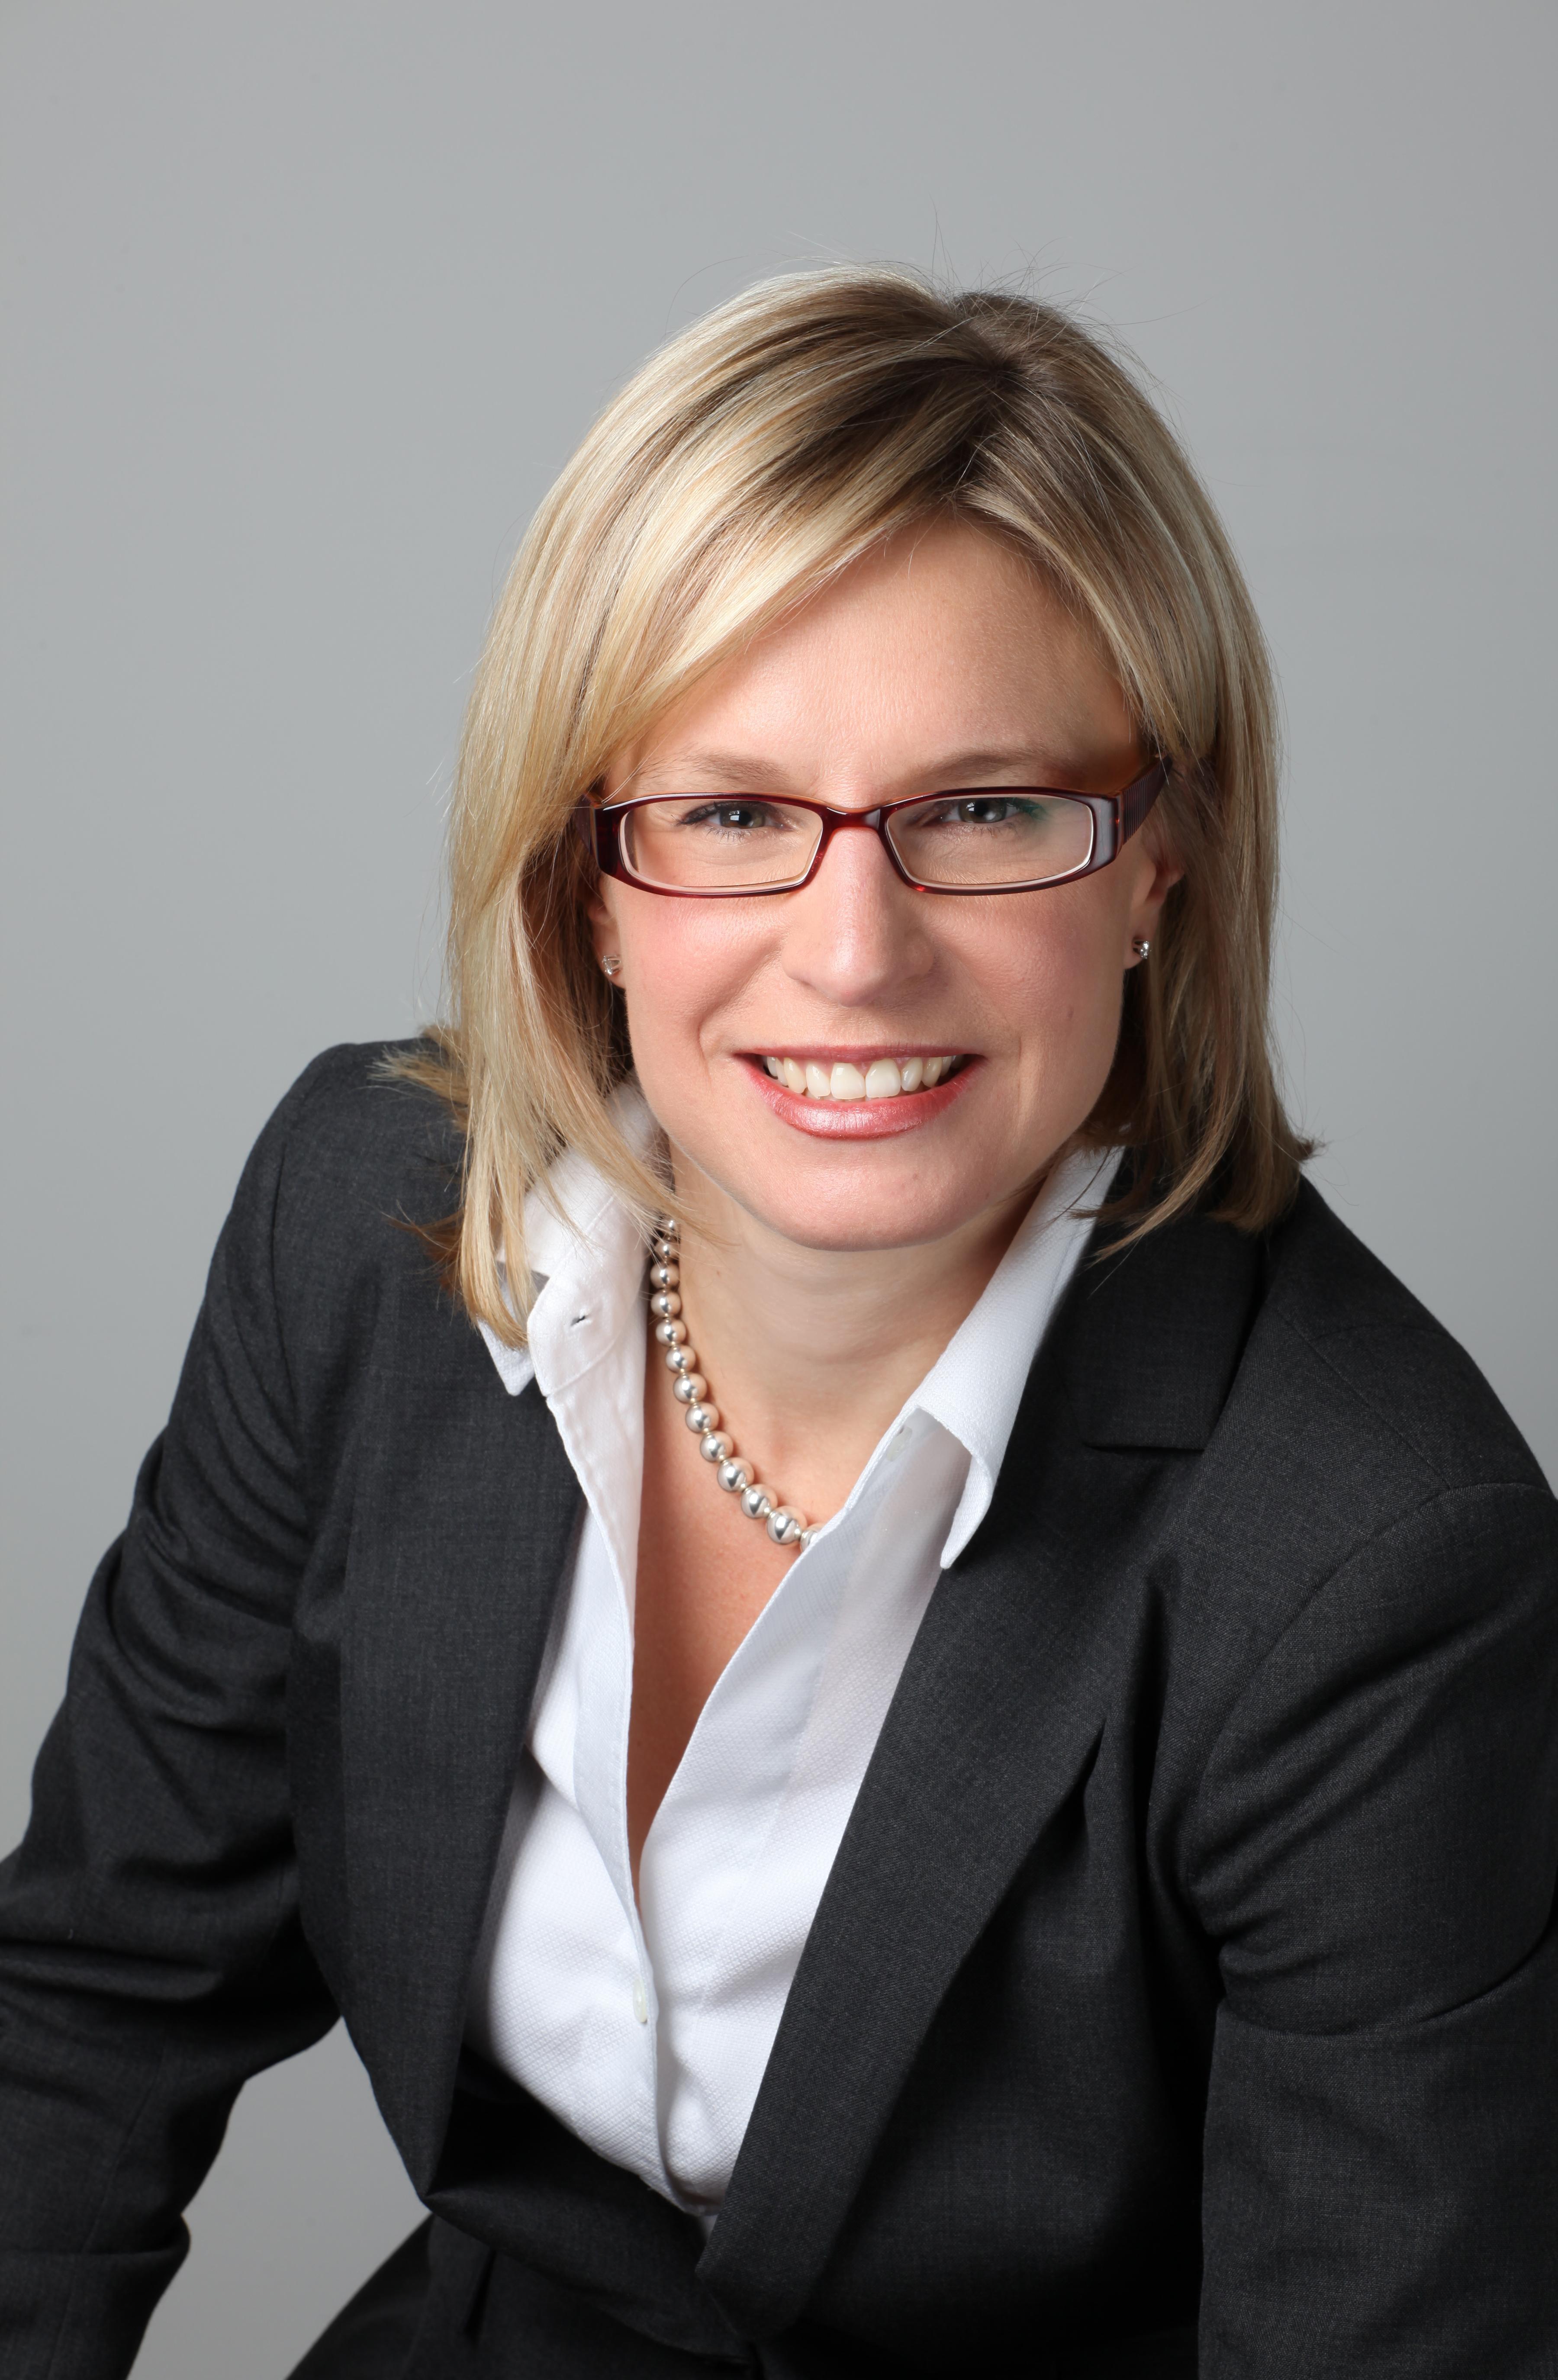 Jenine Krause